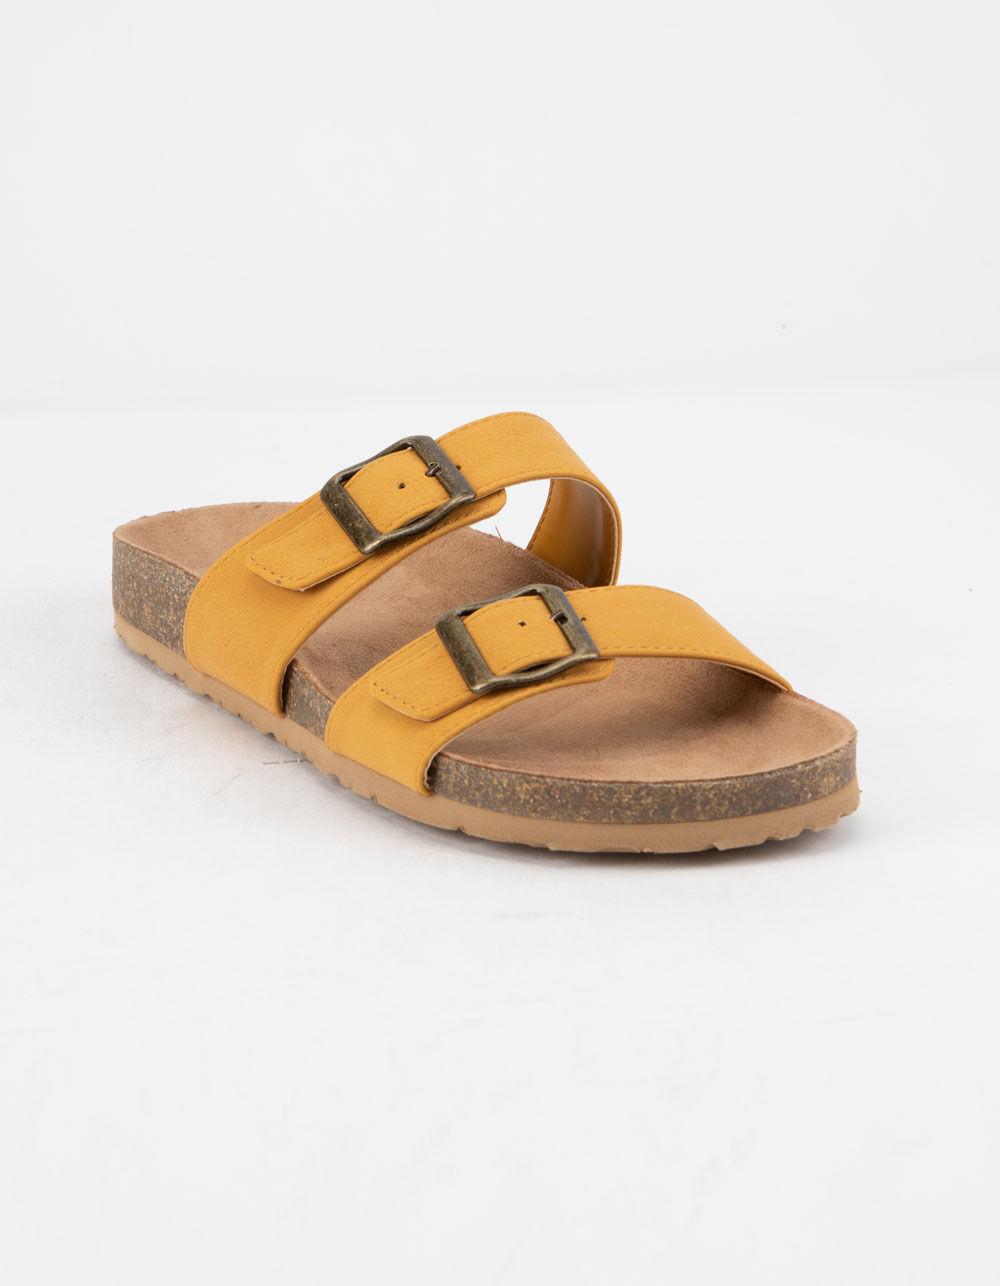 SODA Double Buckle Mustard Slide Sandals